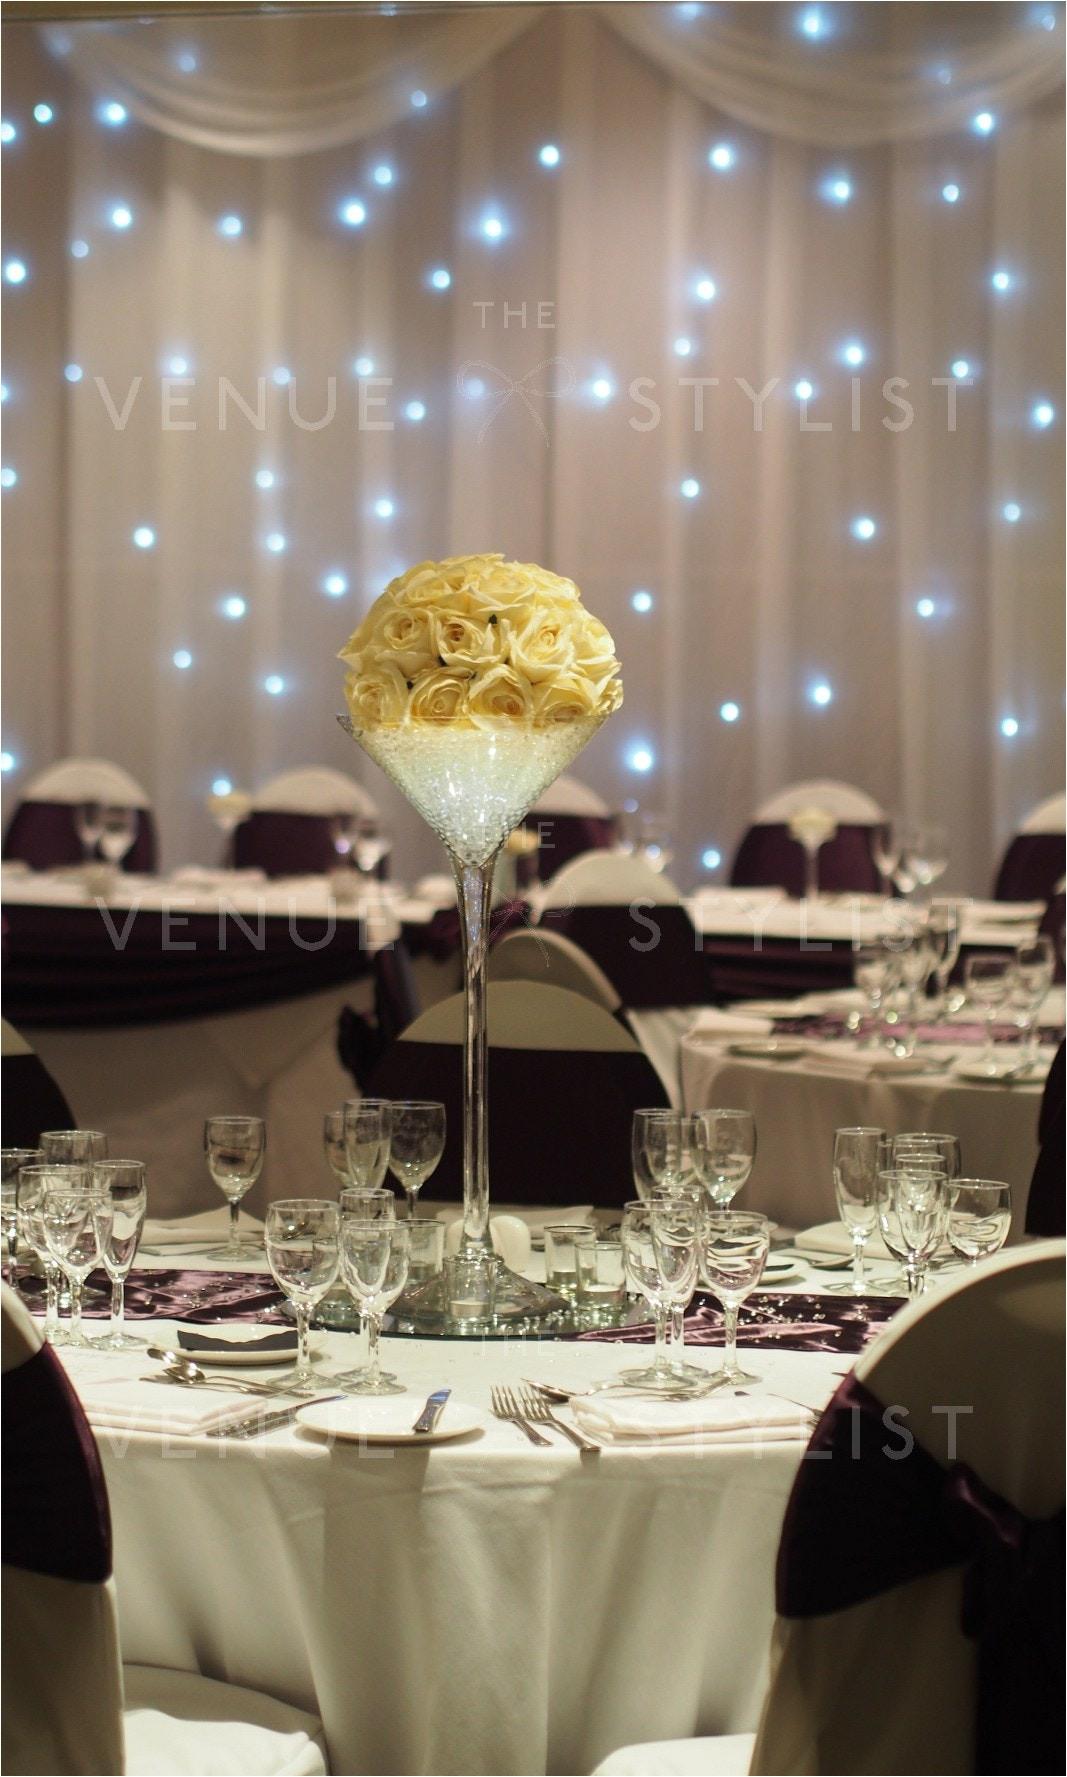 decorative vases of decor ideas for party p h vases martini vase centrepiece i 0d ideas in decor ideas for party p h vases martini vase centrepiece i 0d ideas hire table design